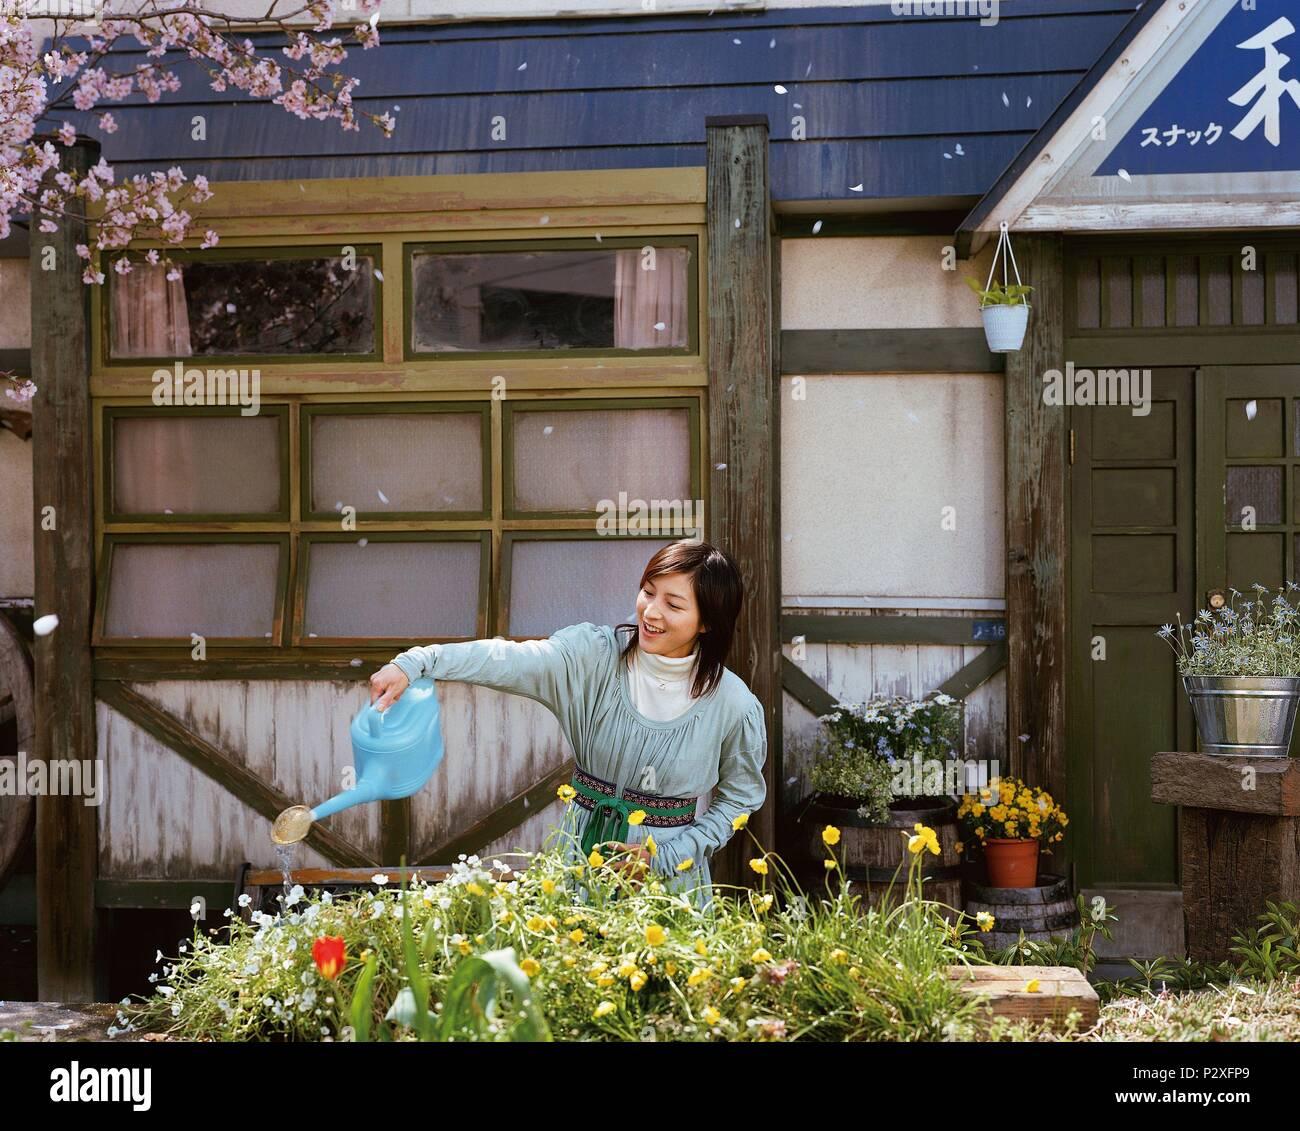 Original Film Title: OKURIBITO.  English Title: DEPARTURES.  Film Director: YOJIRO TAKITA.  Year: 2008.  Stars: RYOKO HIROSUE. Credit: AMUSE SOFT ENTERTAINMENT/ASAHI SHIMBUNSHA/DENTSU / Album - Stock Image